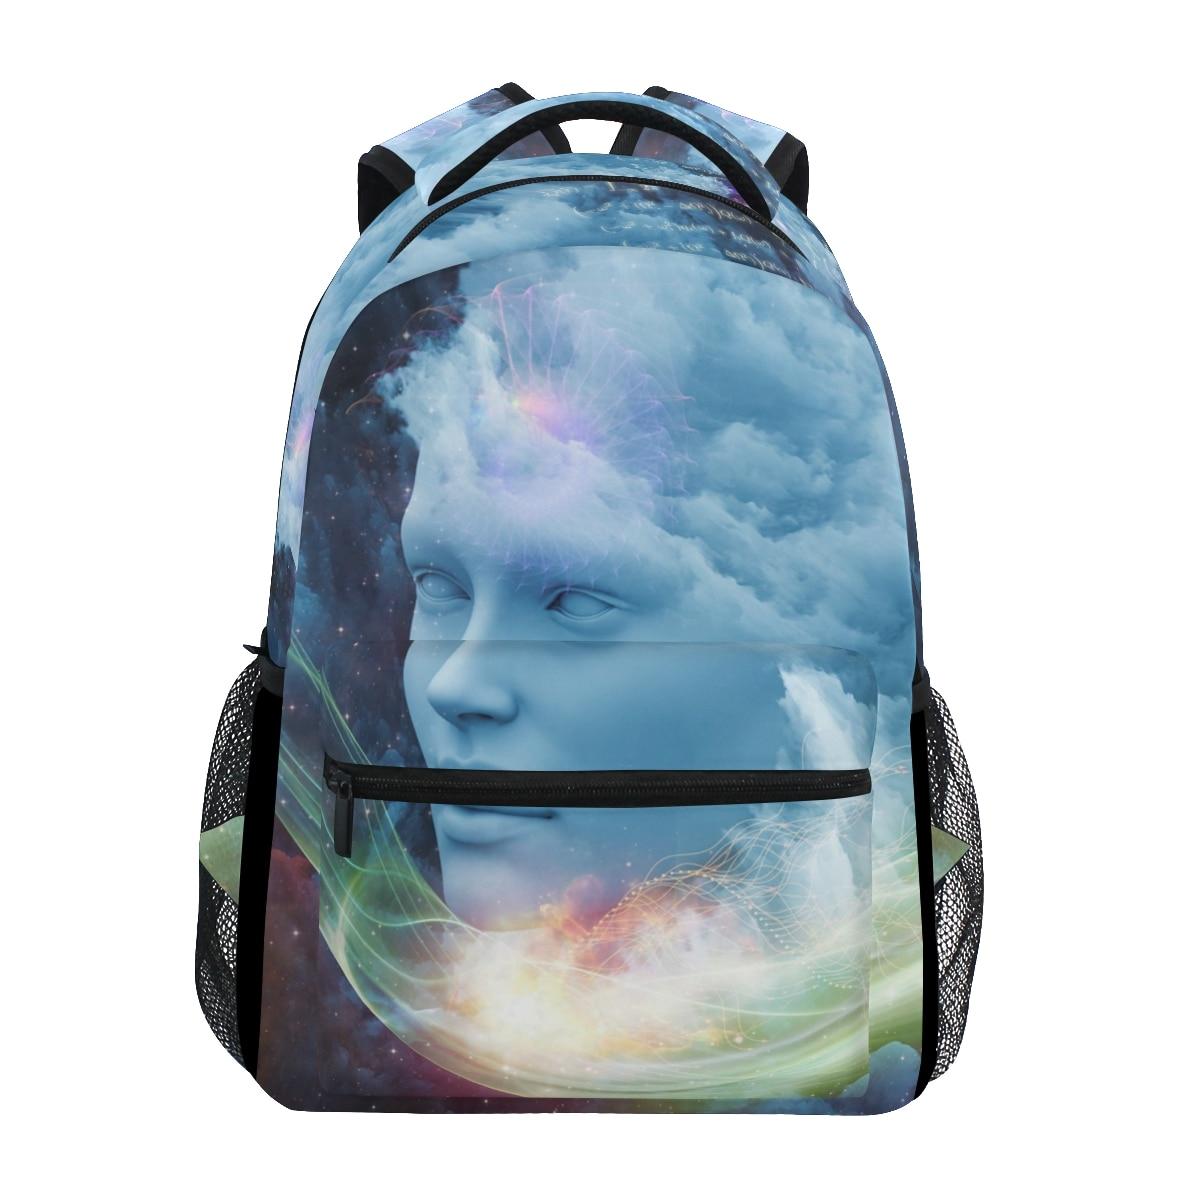 ALAZA Backpacks Girls School Bags Portrait Starry Sky Prints Fashion Backpack Student Black Schoolbags Book Bag New Leisure Bag